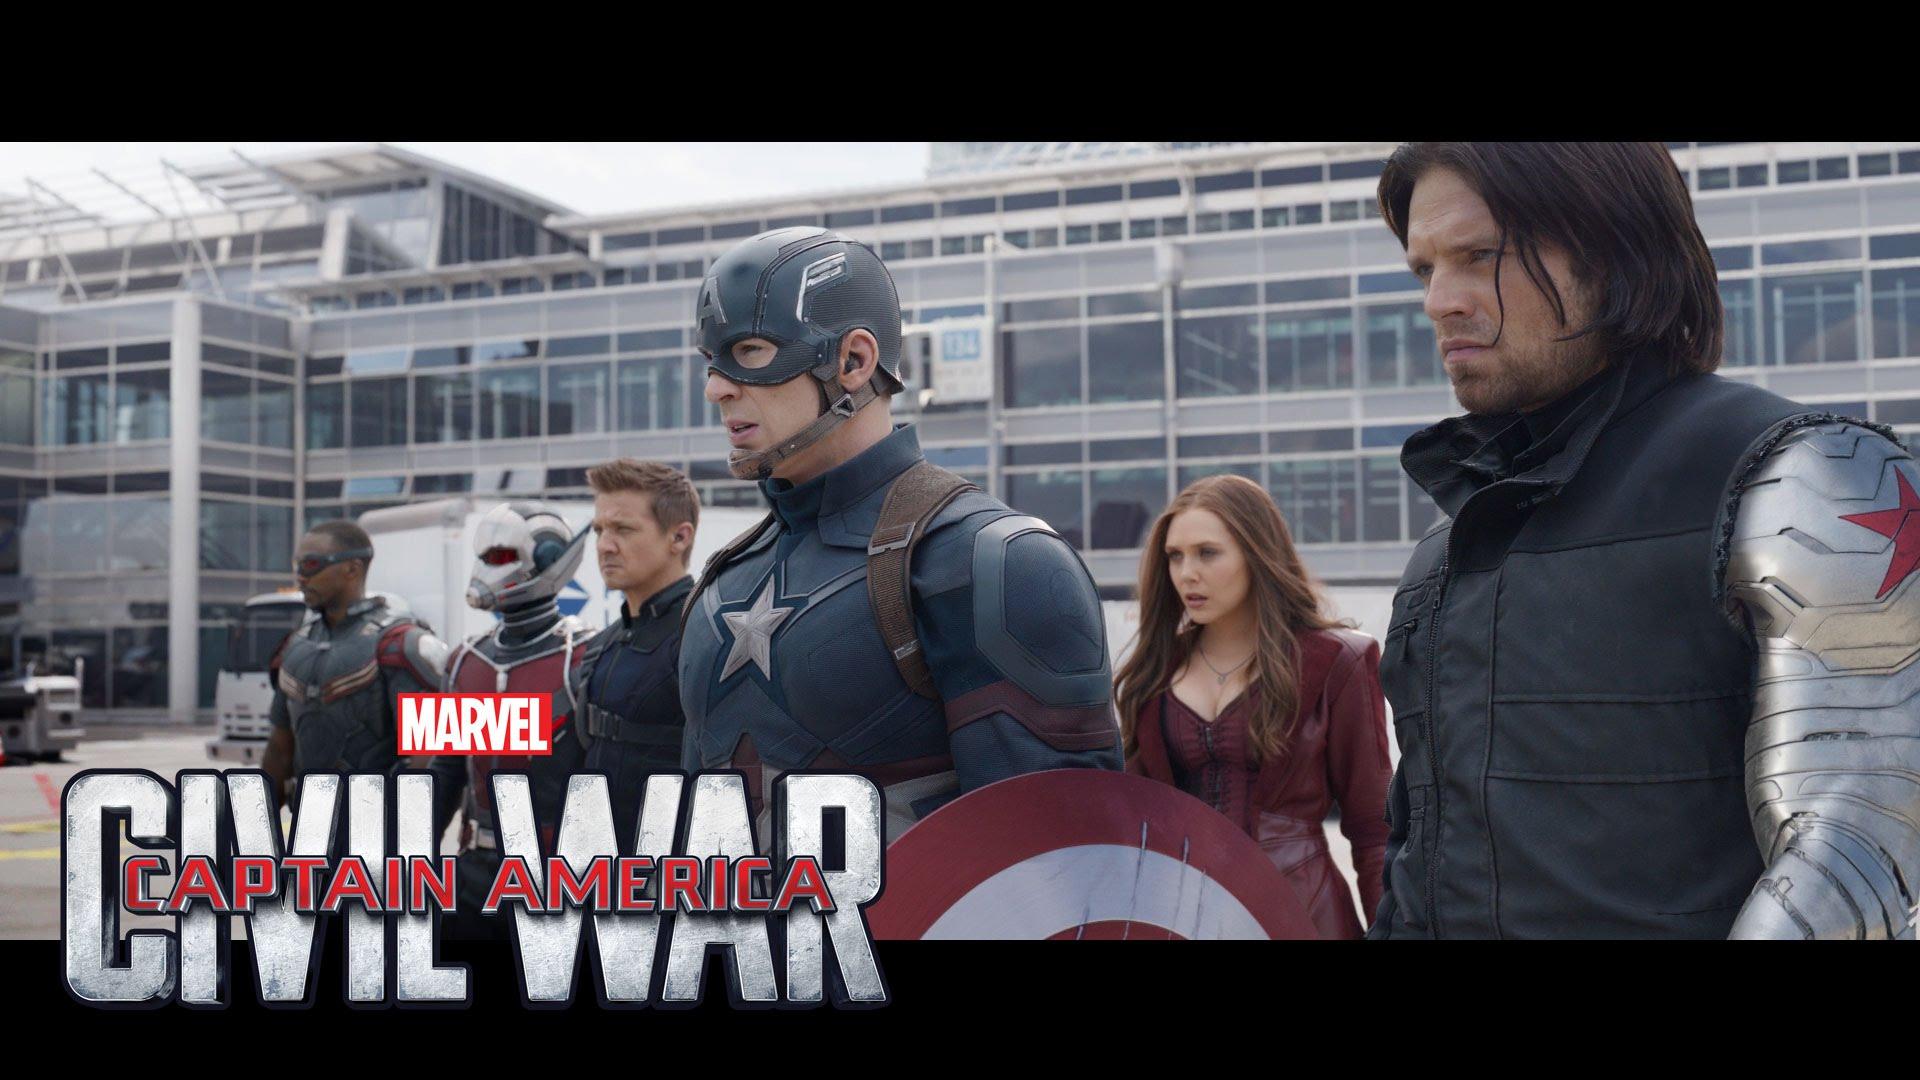 The Safest Hands - Marvel's Captain America: Civil War